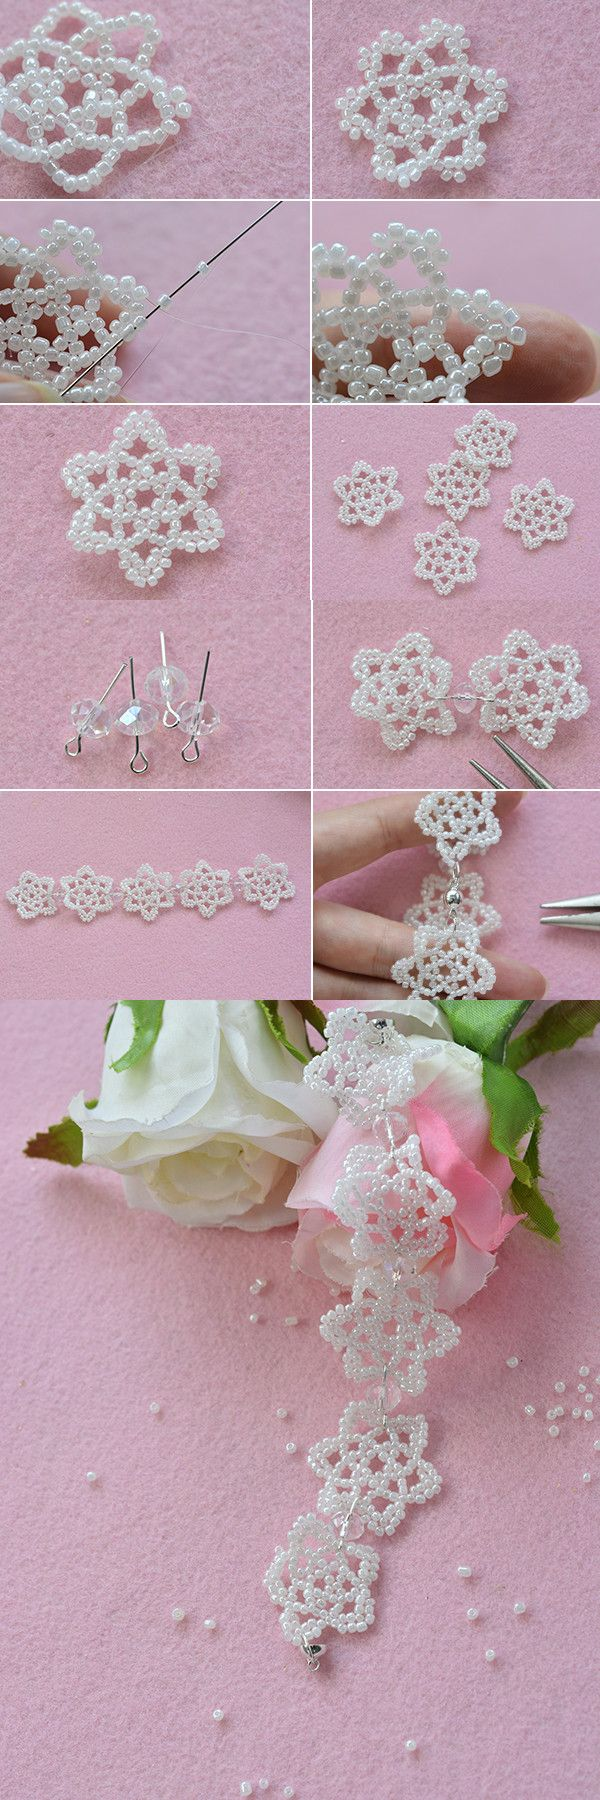 White beaded flower bracelet, like it? LC.Pandahall.com will publish the tutorial soon.                      #pandahall